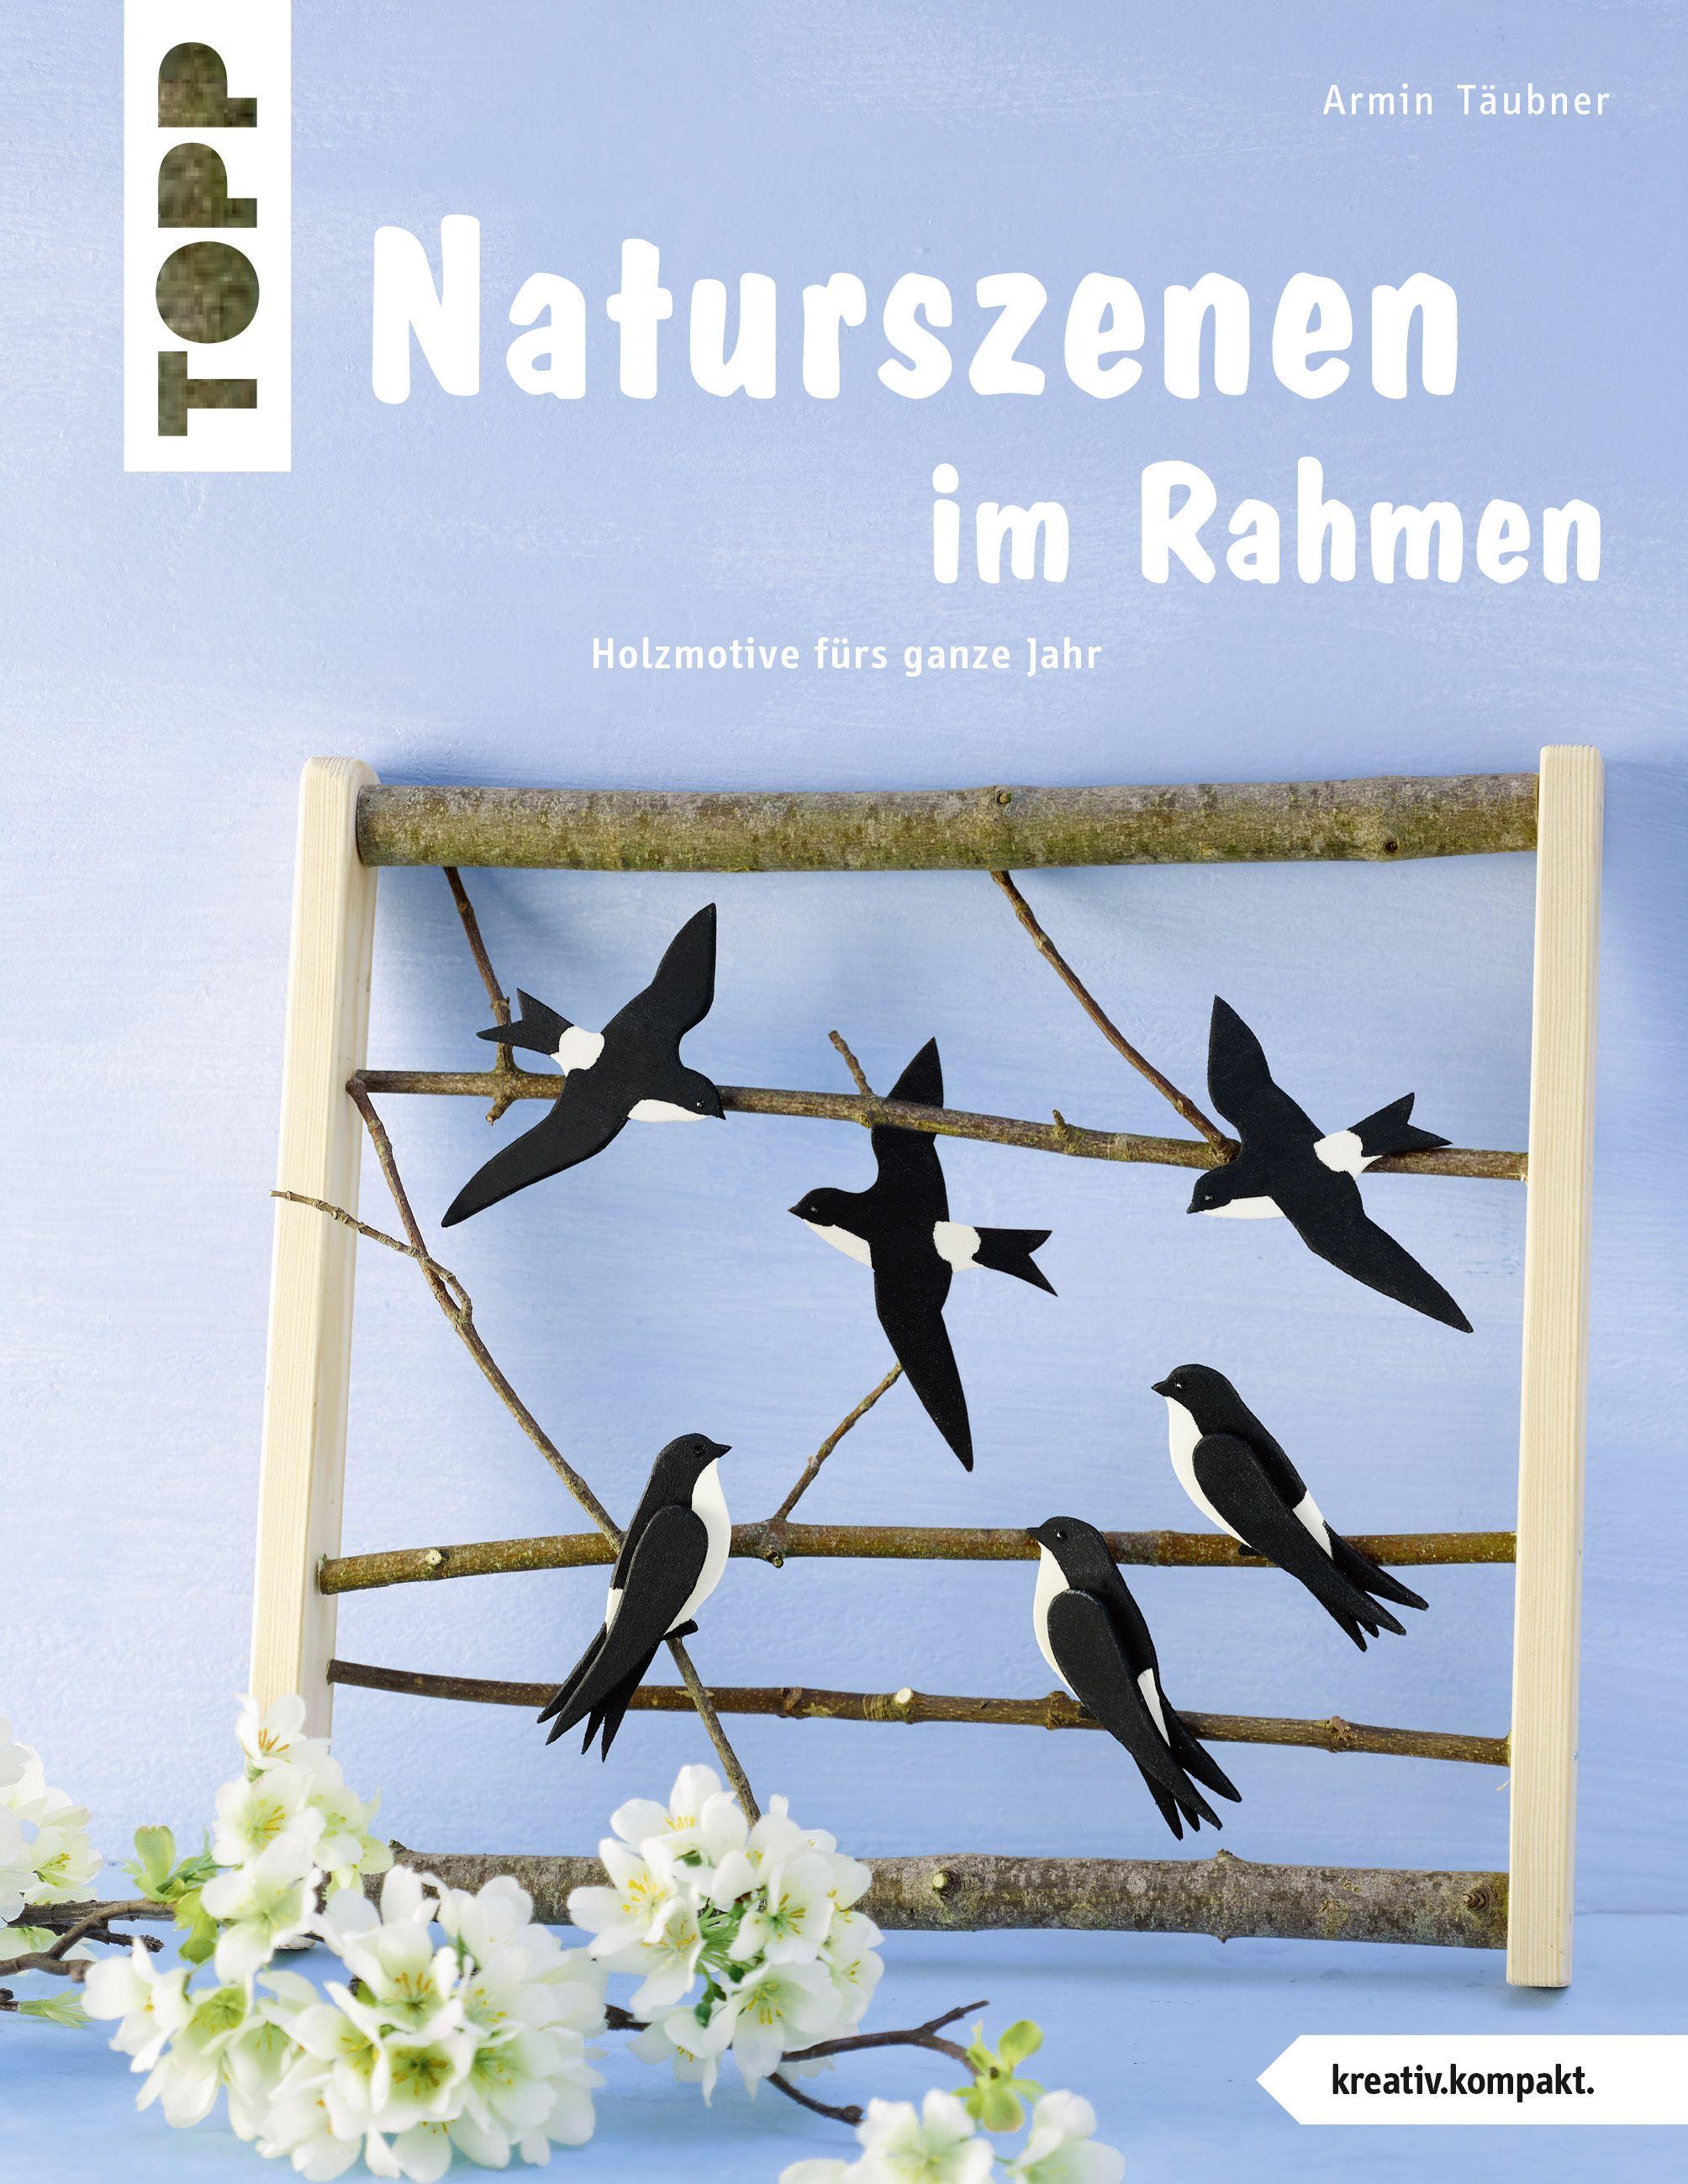 Naturszenen im Rahmen von Armin Täubner https://www.topp-kreativ.